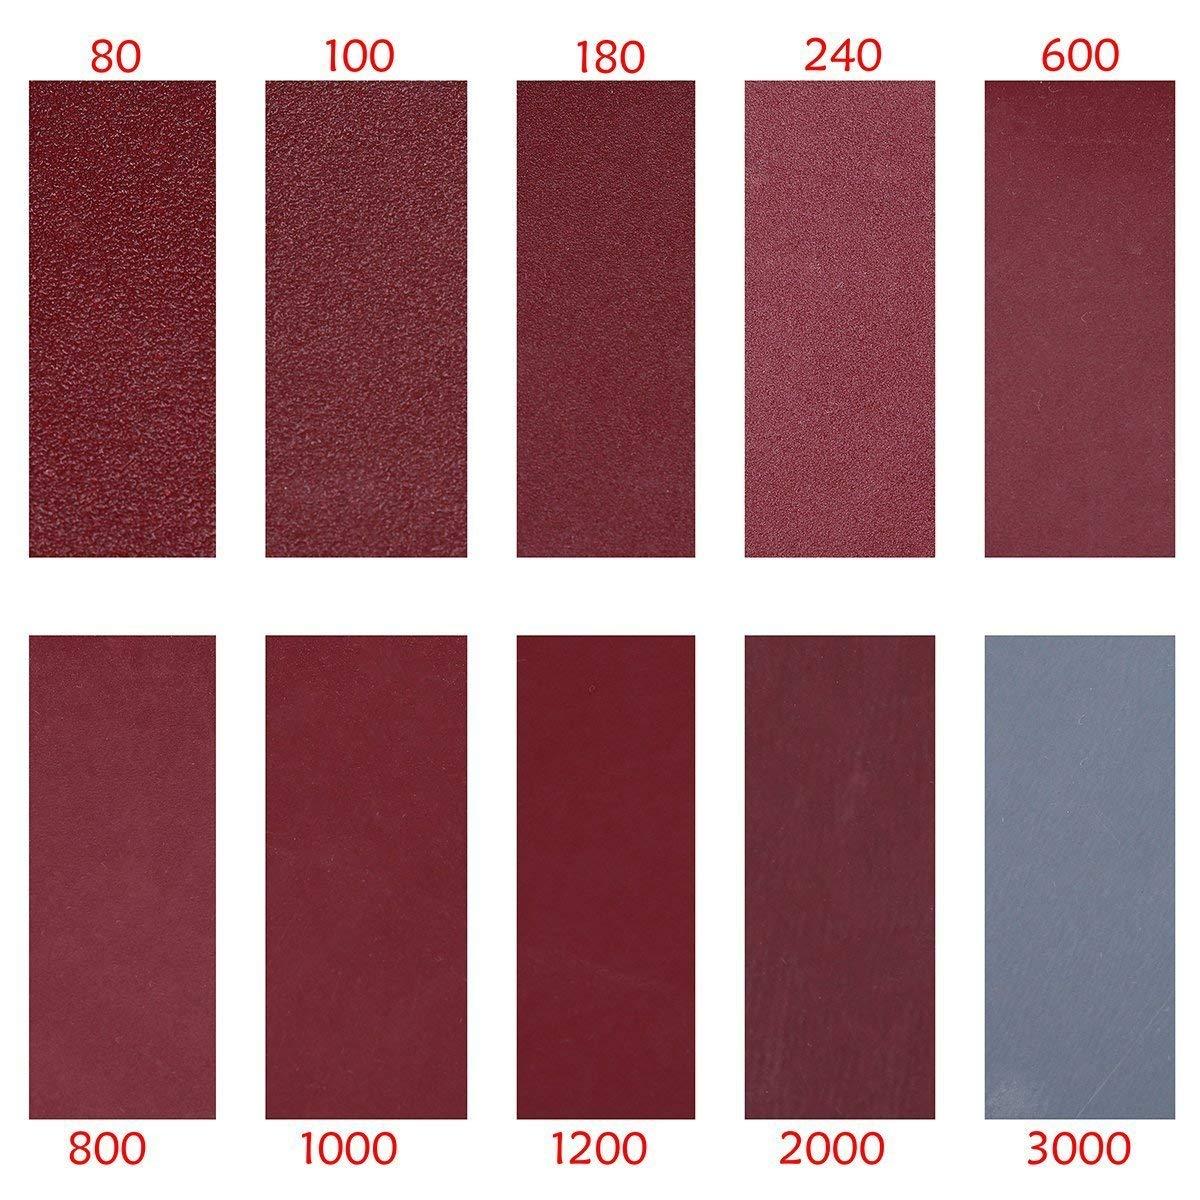 100-Pack 2 inch Sander Disc DeSS Aluminium Oxide Hook /& Loop Sanding Discs 10PCS Each of 80//100//180//240//600//800//1000//1200//2000//3000 Grit